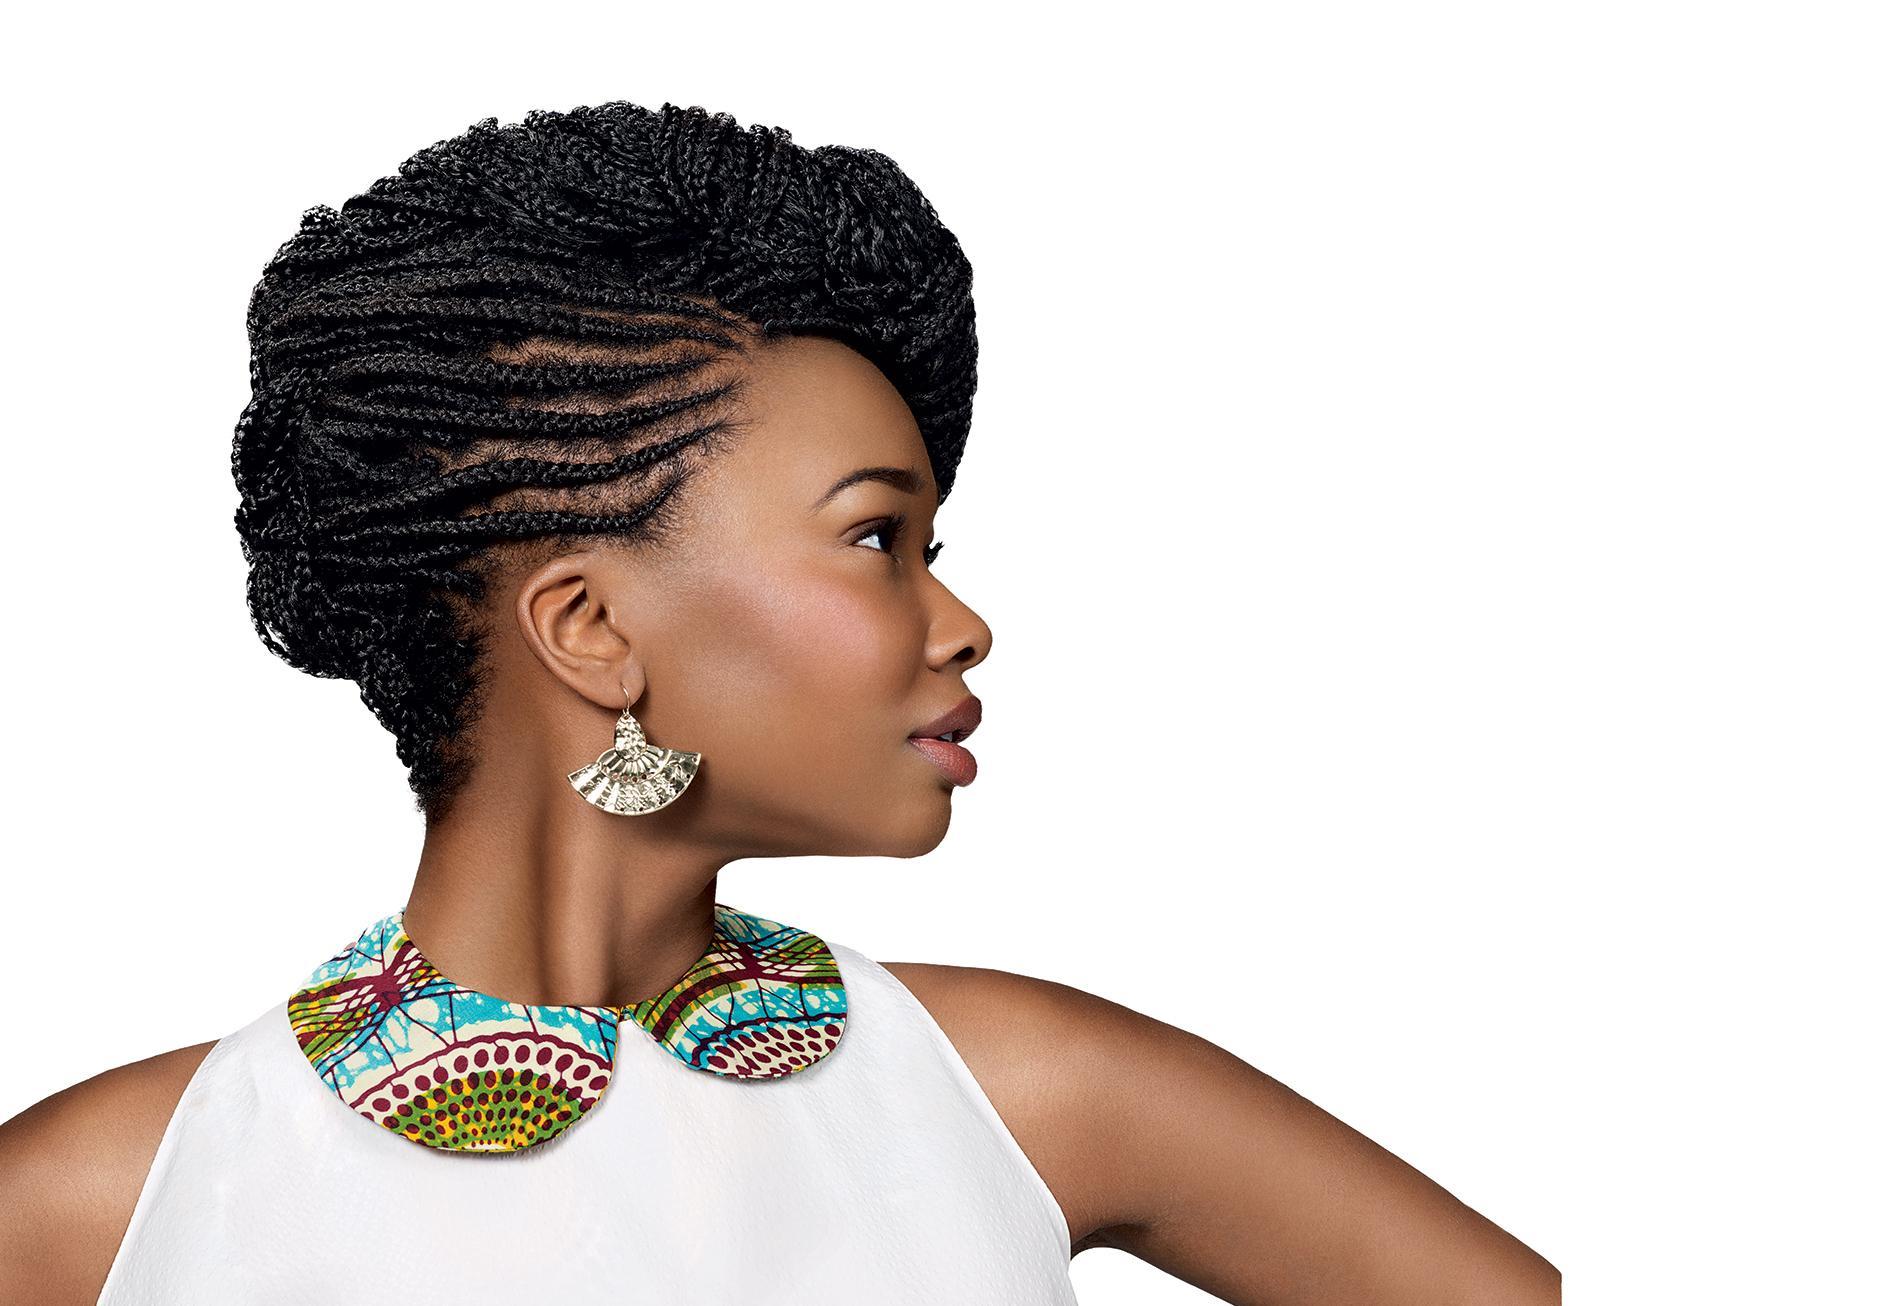 Les femmes noires en france